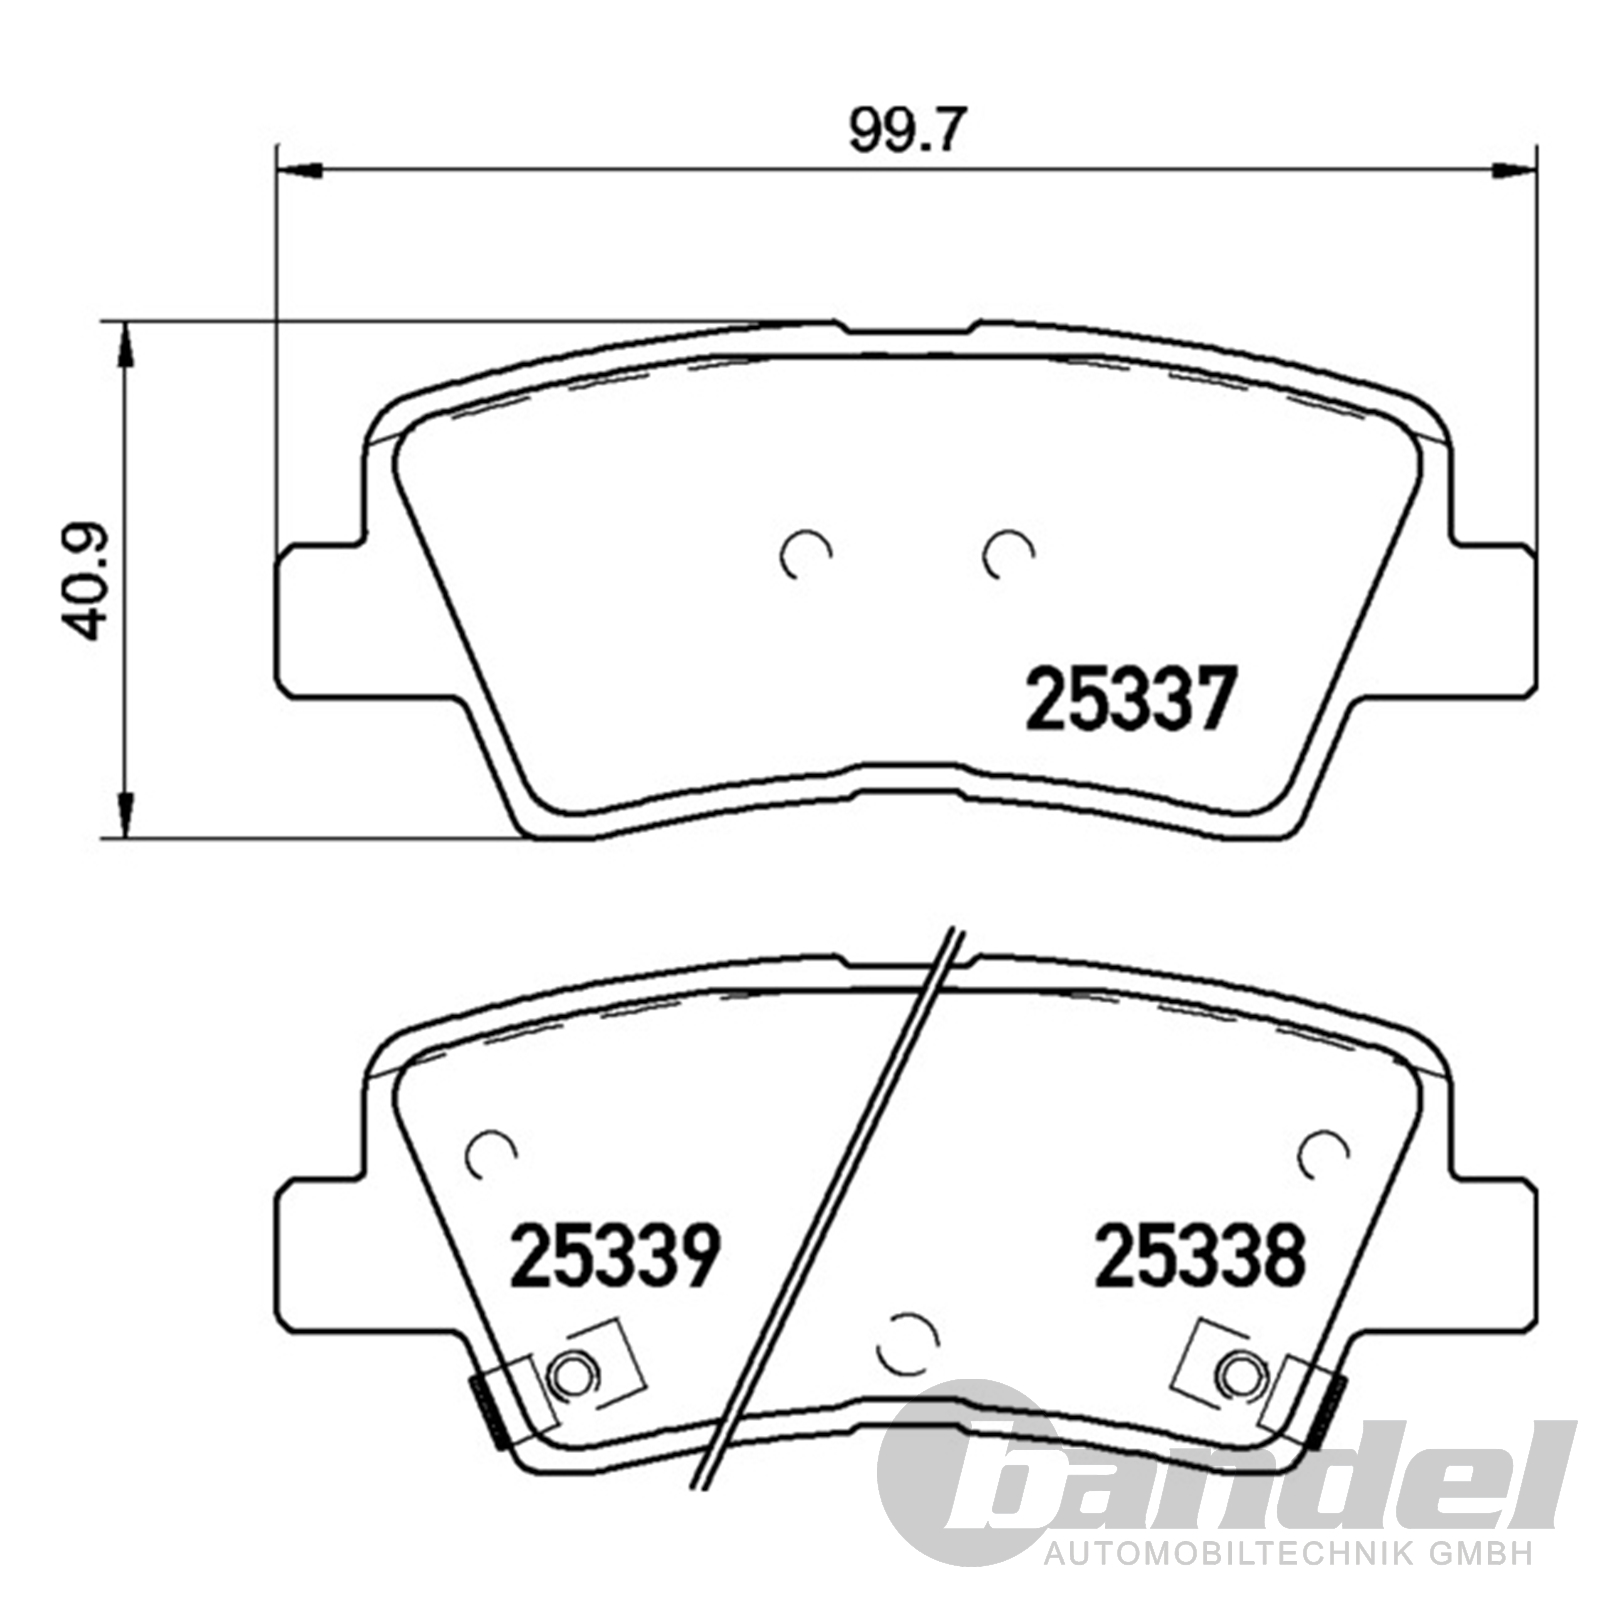 bremsscheiben 284mm bel ge hinten hyundai i40 i40 cw. Black Bedroom Furniture Sets. Home Design Ideas